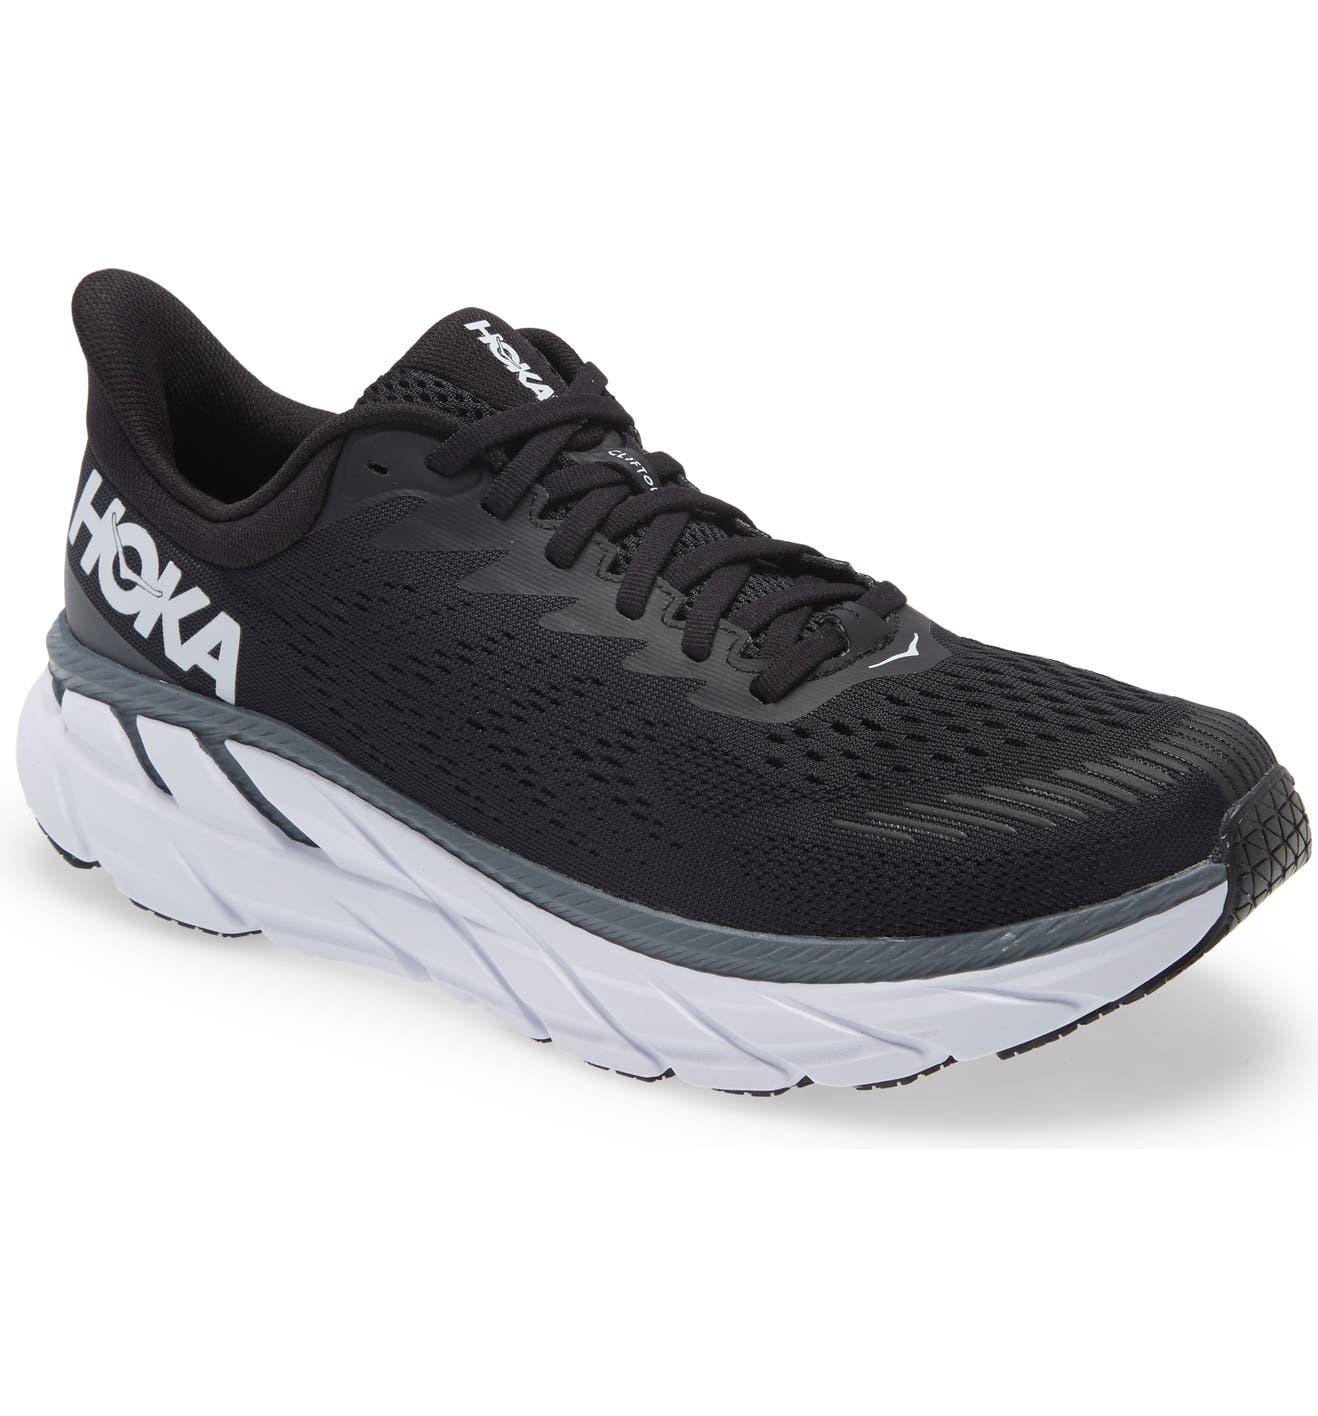 Clifton 7 Running Shoe, Main, color, BLACK / WHITE